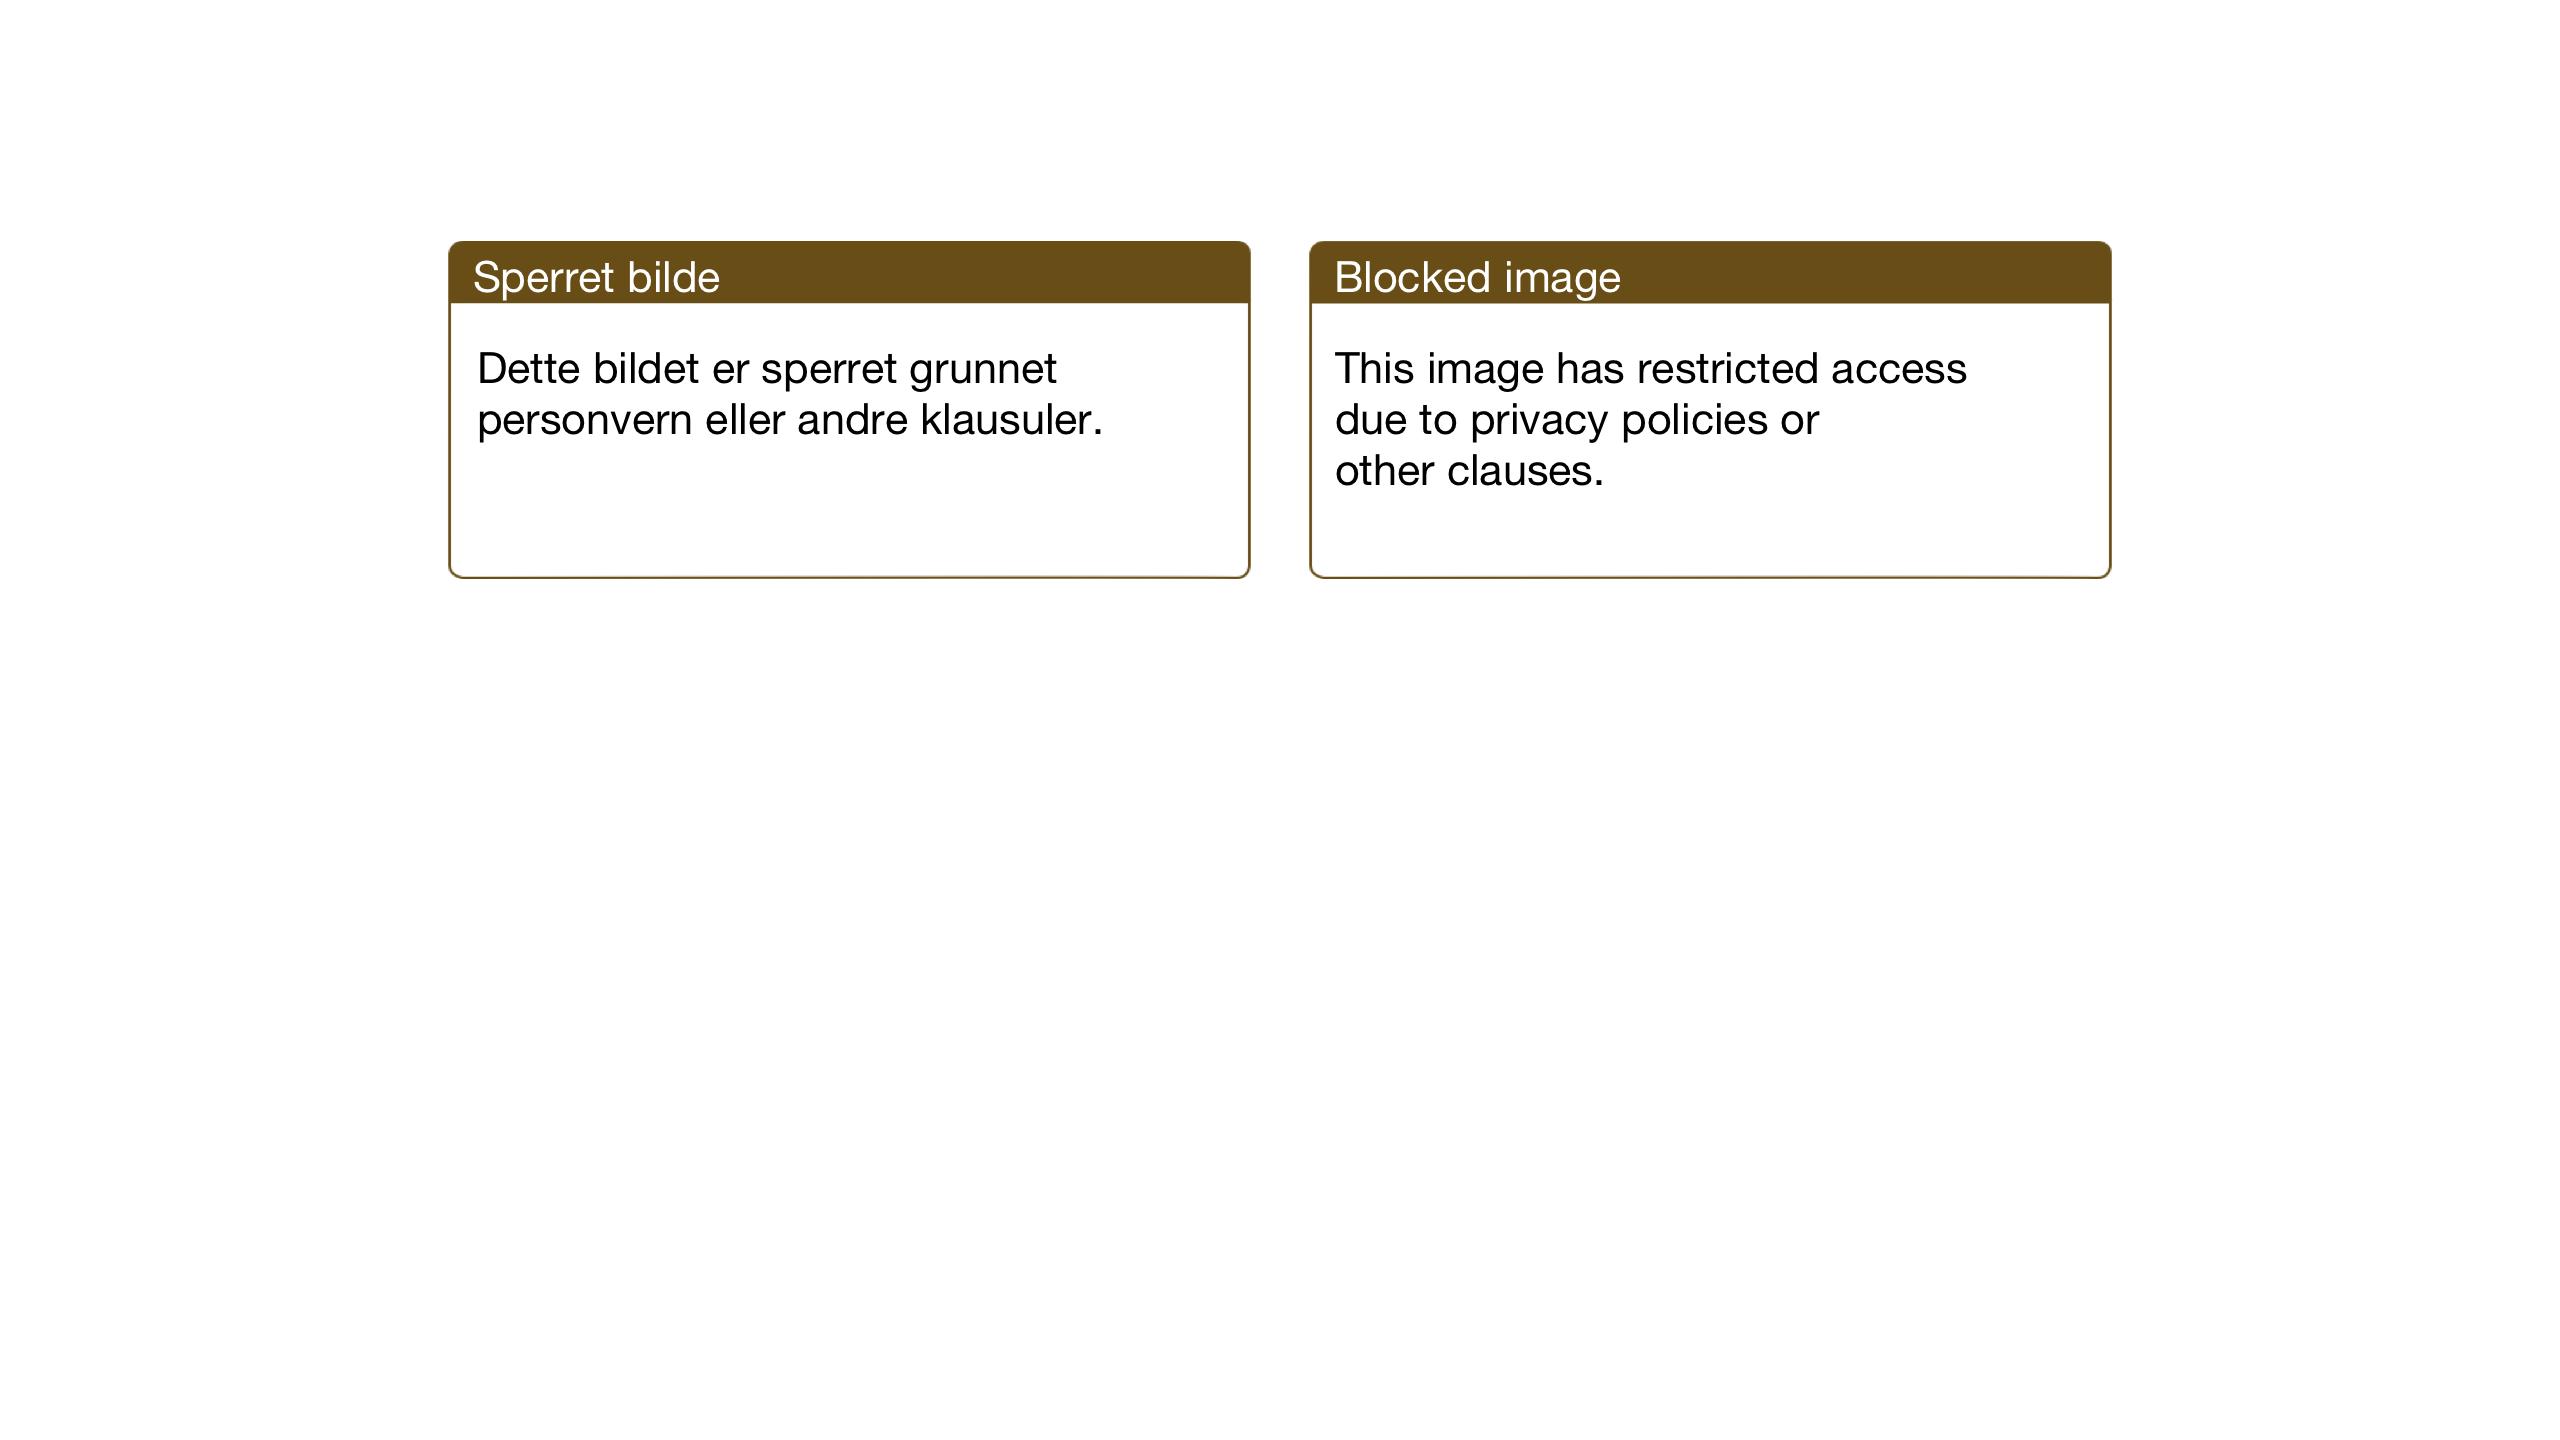 SAH, Vardal prestekontor, H/Ha/Haa/L0018: Ministerialbok nr. 18, 1930-1945, s. 26